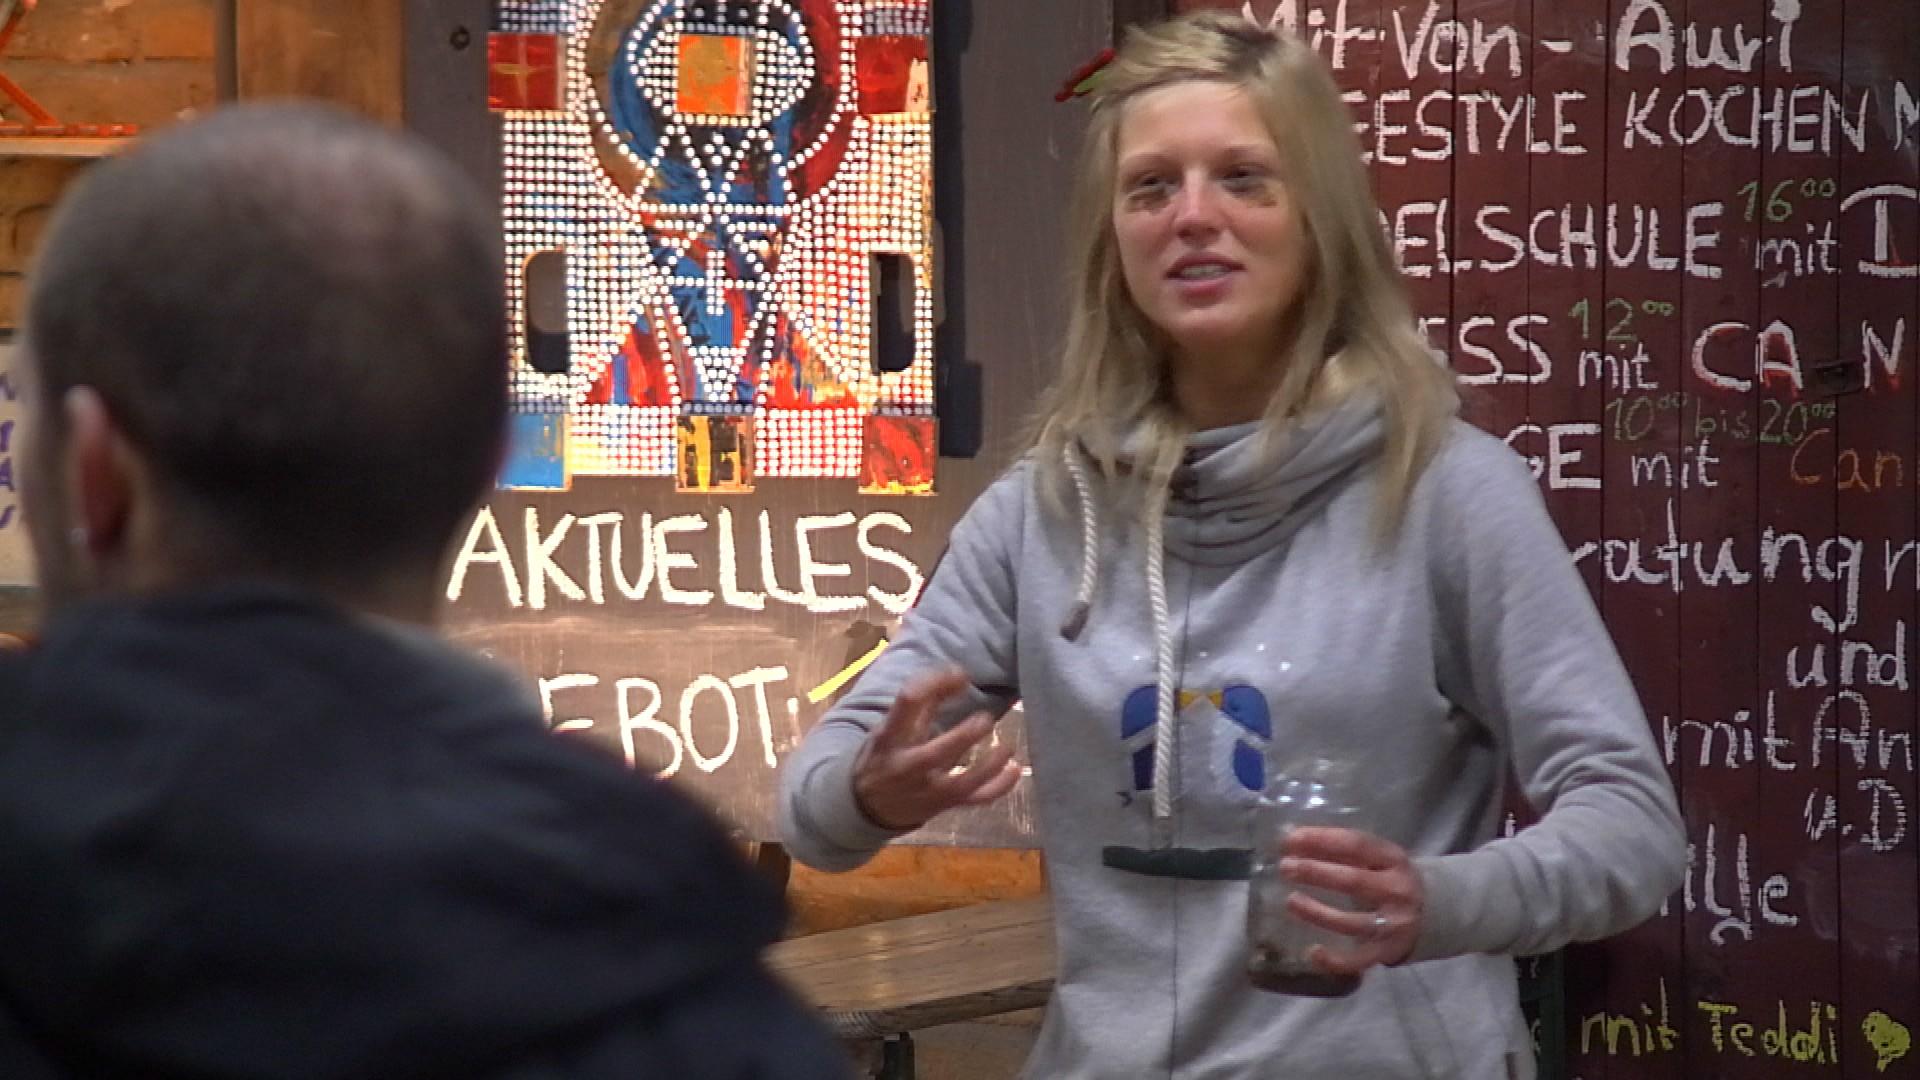 Newtopia Karolina raus Auszug Folge 34 Episode 10.04.2015 - Kopie